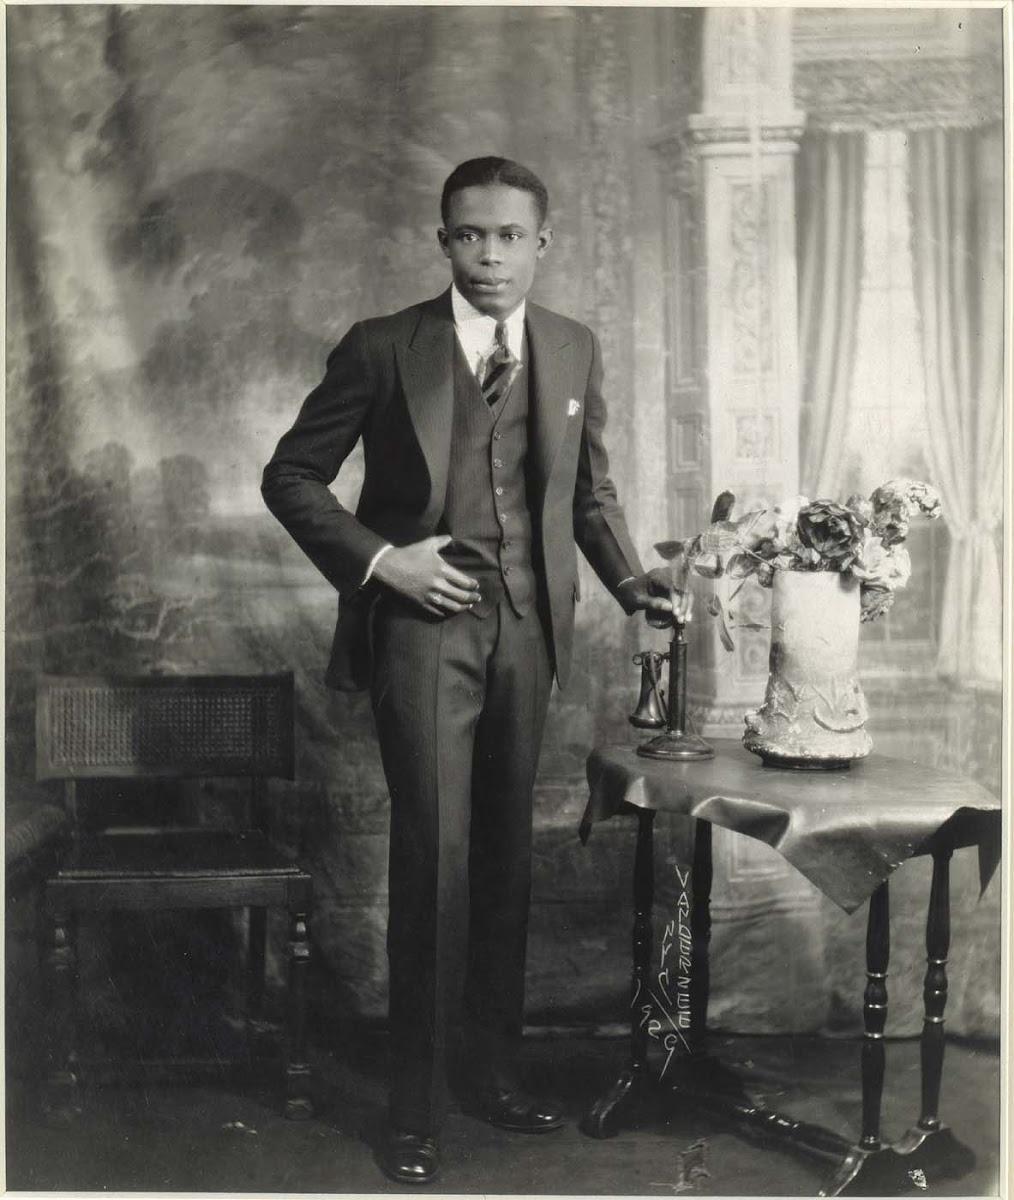 6 Vanderzee-YoungManWTelephone-1929